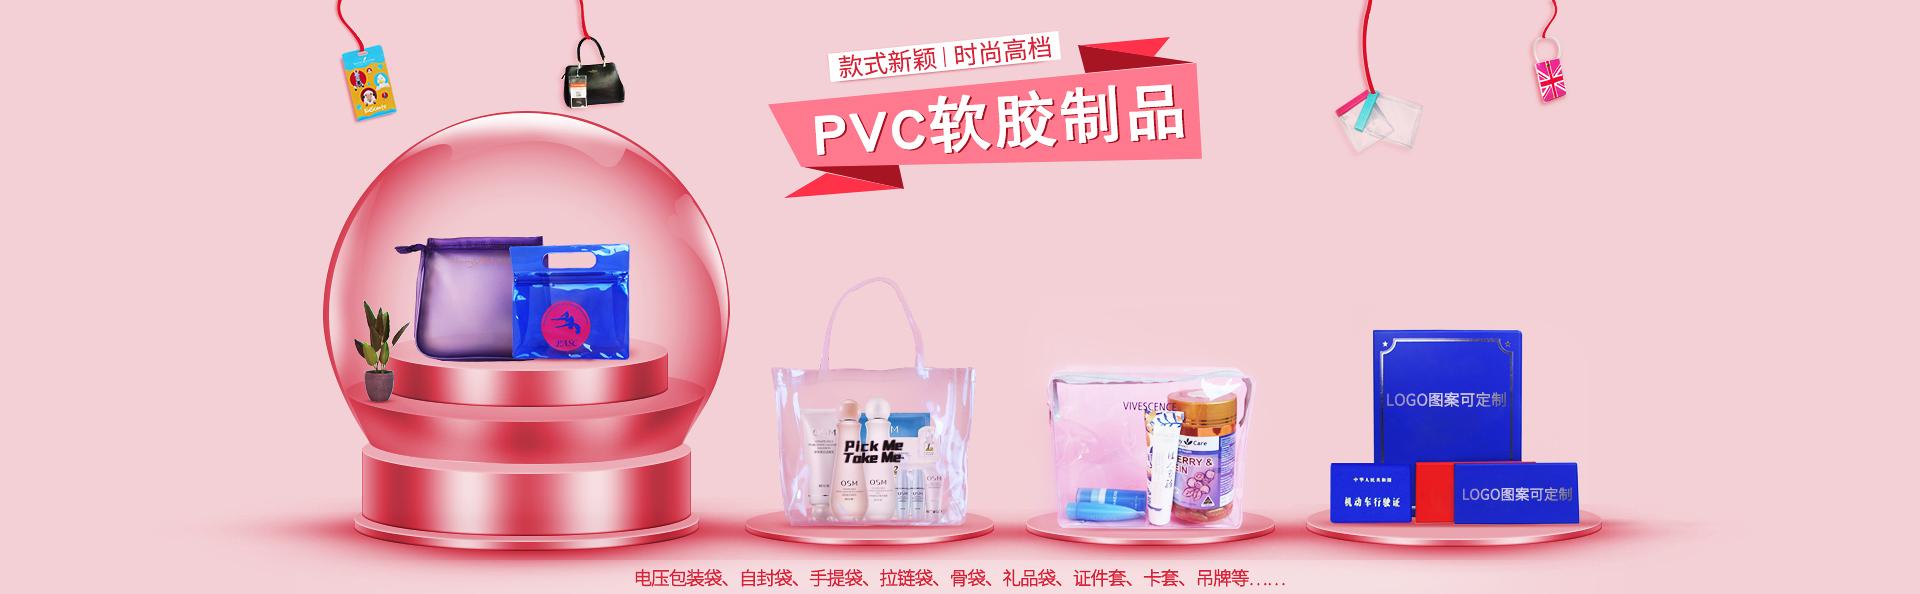 PVC软胶